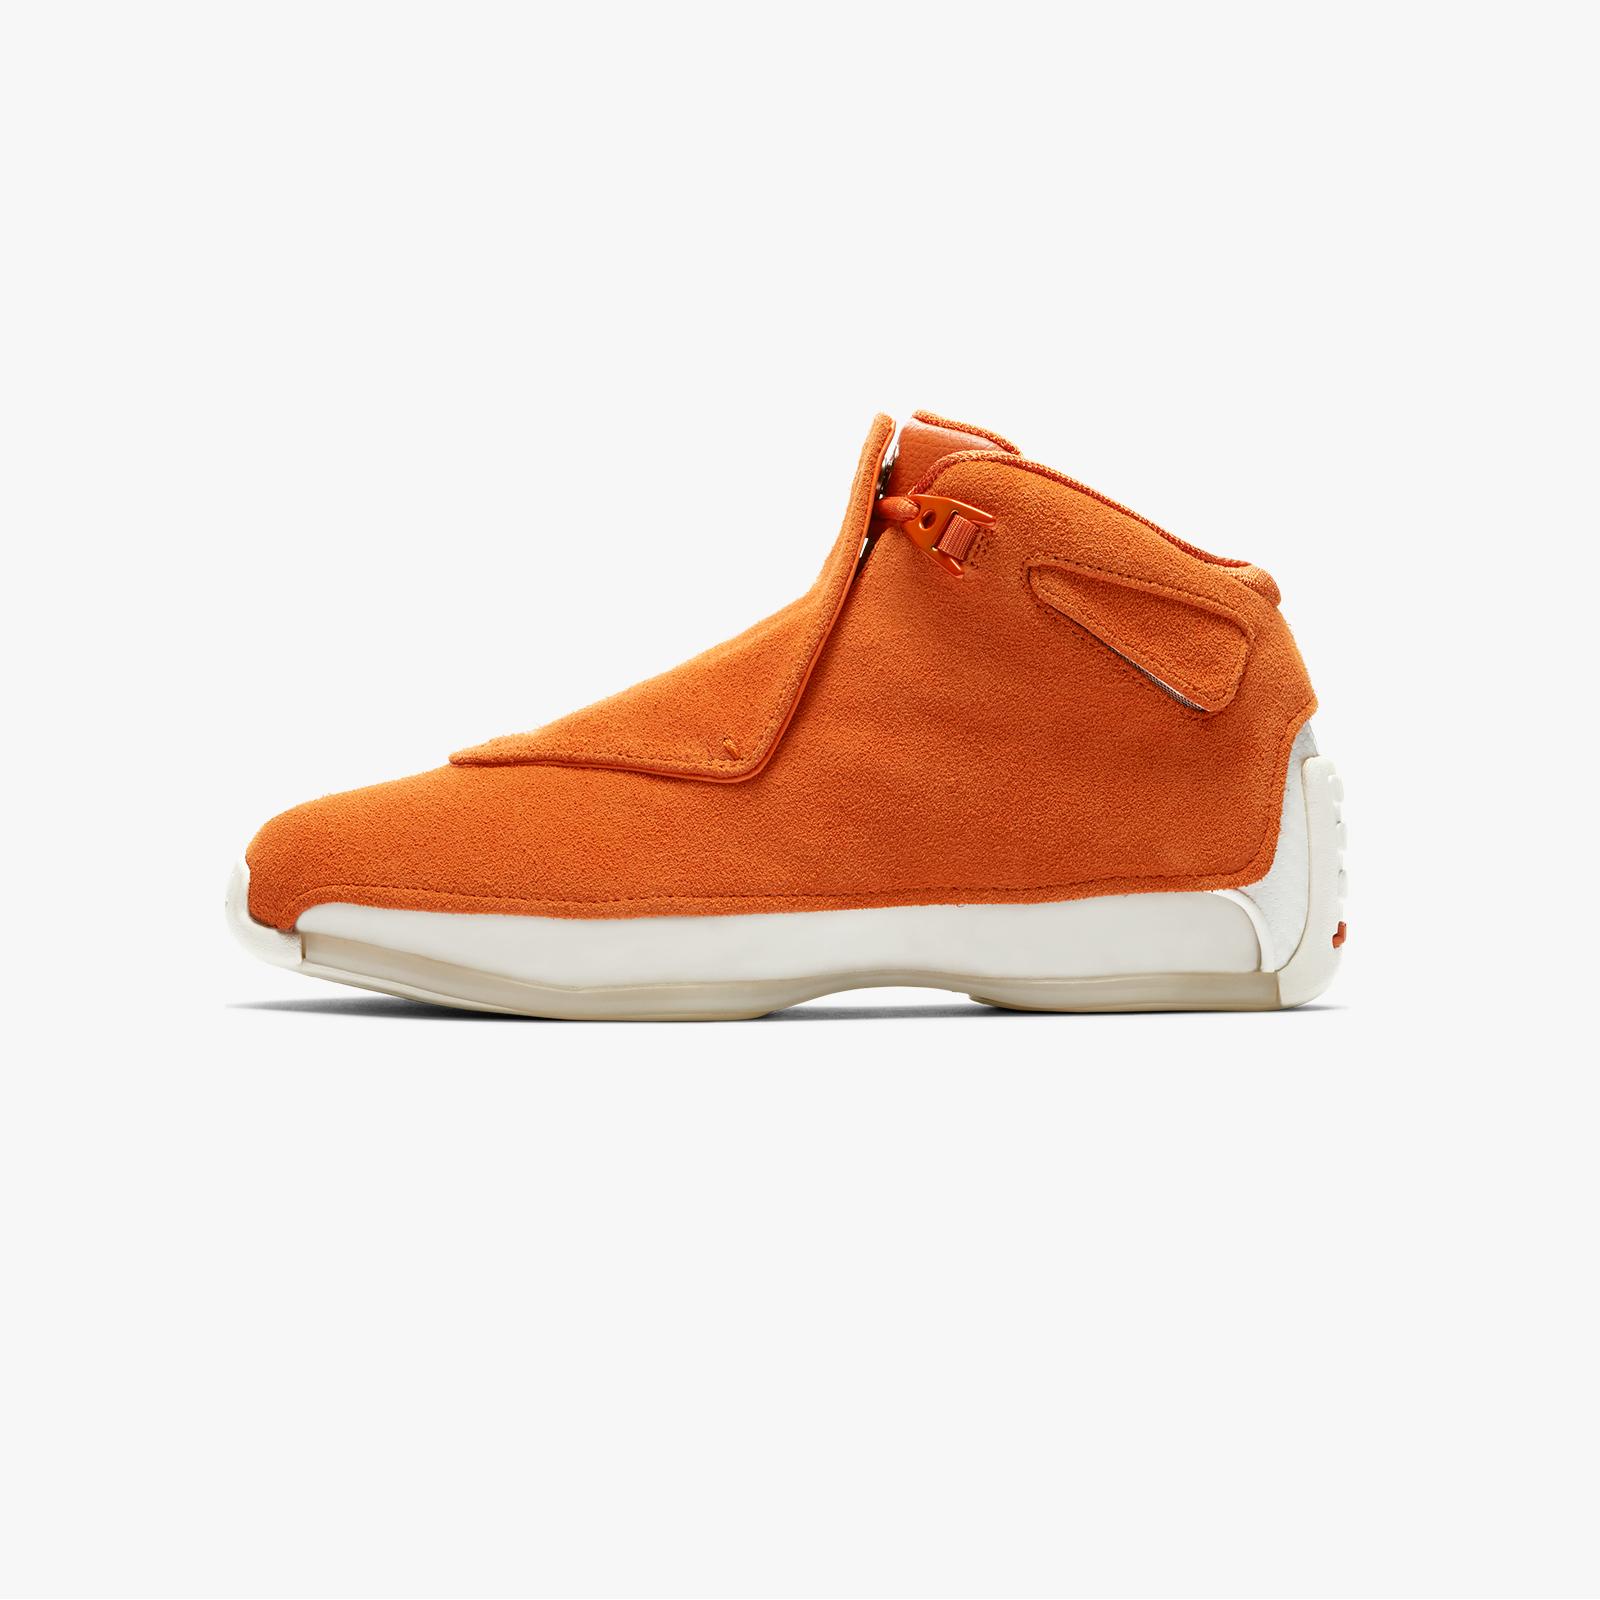 super popular 2d9a8 3bb5a Jordan Brand Air Jordan 18 Retro - Aa2494-801 - Sneakersnstuff   sneakers    streetwear online since 1999